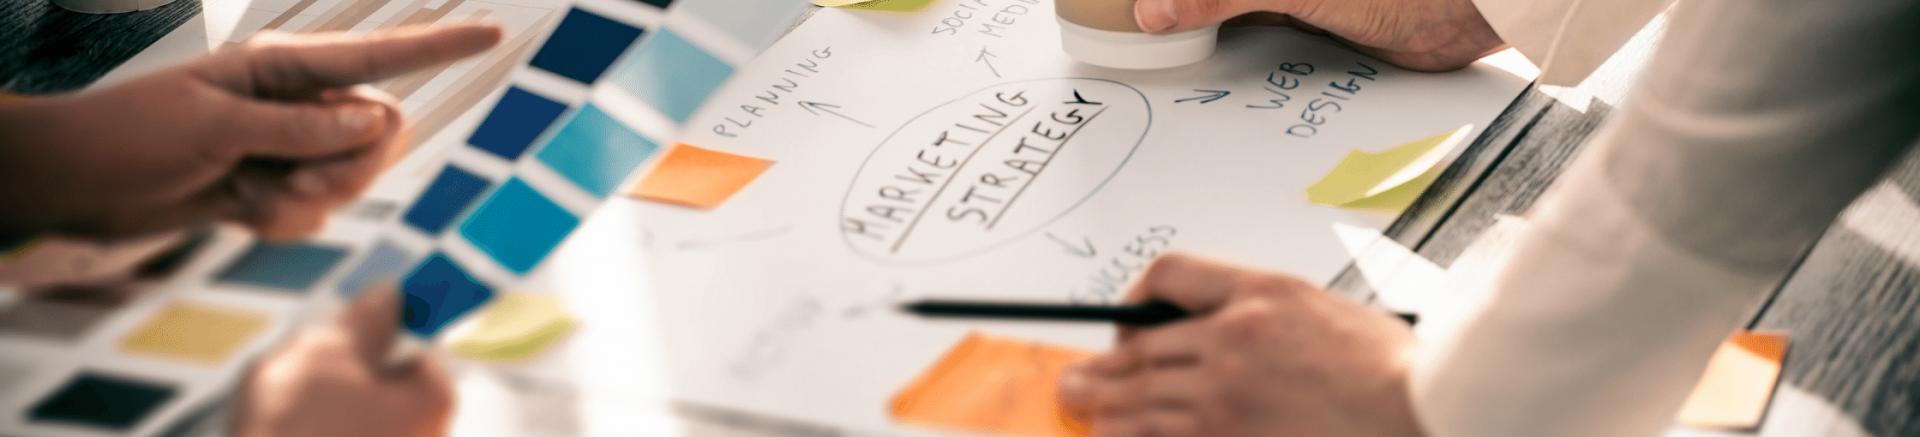 Prepare Your Venture Capital Application | Intrepid Finance